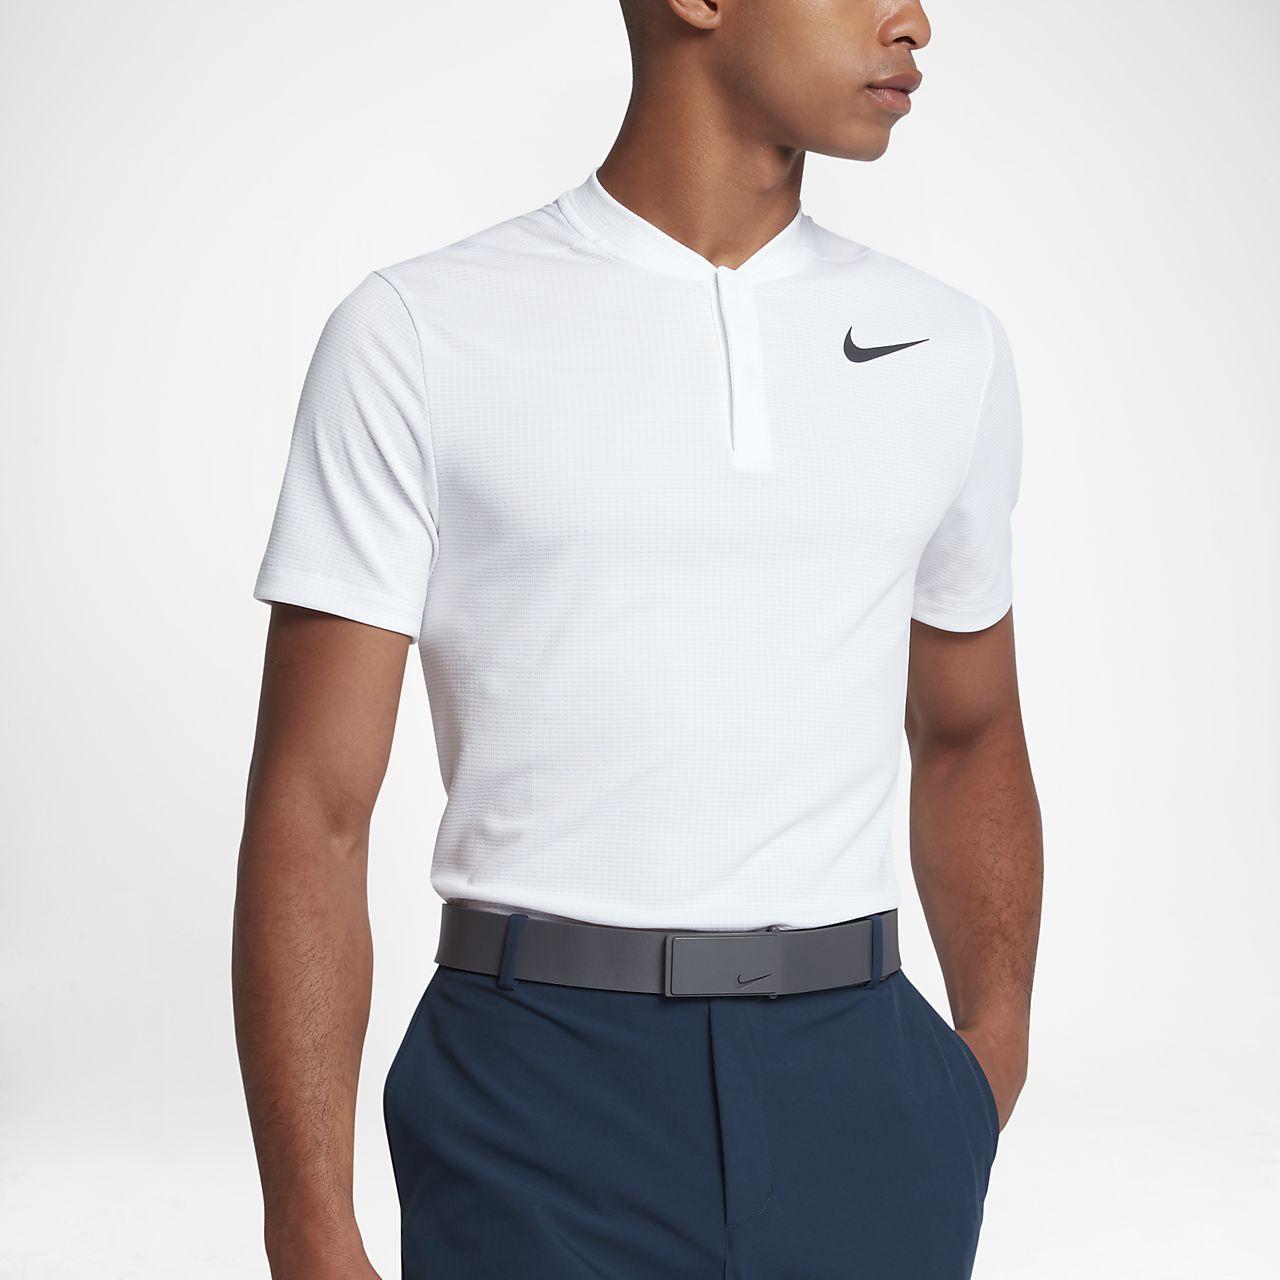 ed304d92 Nike Aeroreact Mens Slim Fit Golf Polo Shirt